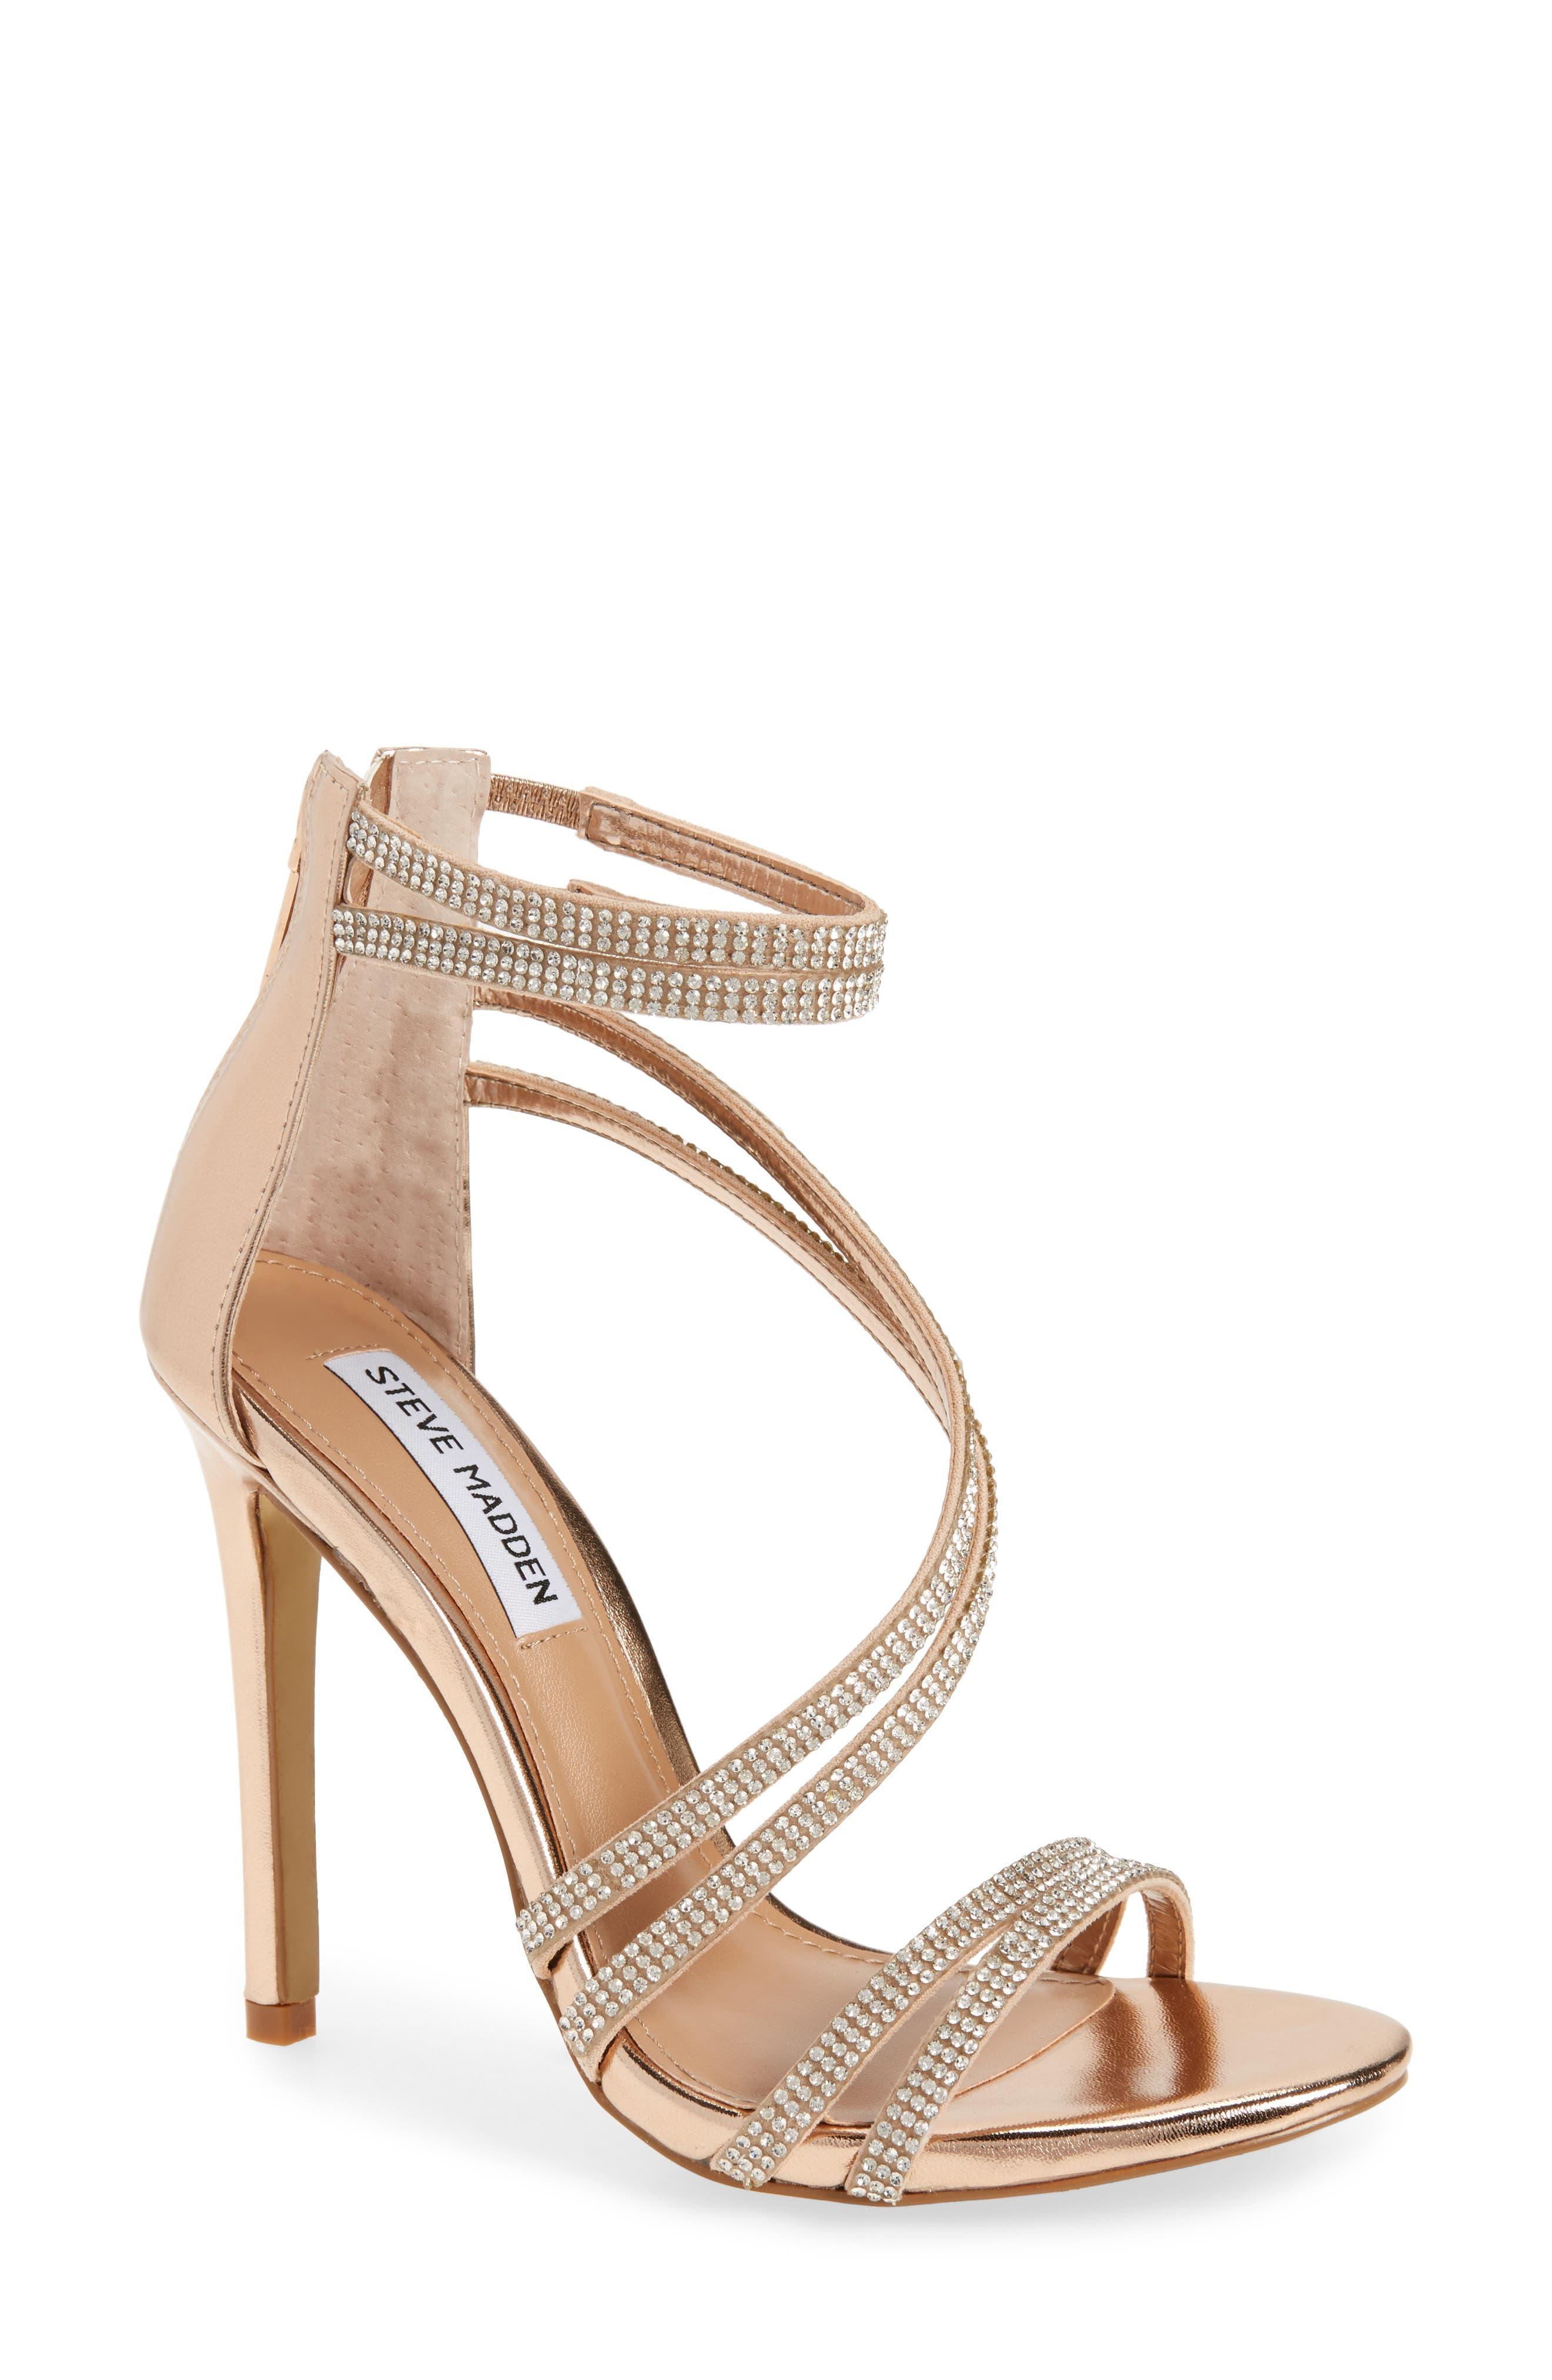 Alternate Image 1 Selected - Steve Madden Sweetest Embellished Sandal (Women)